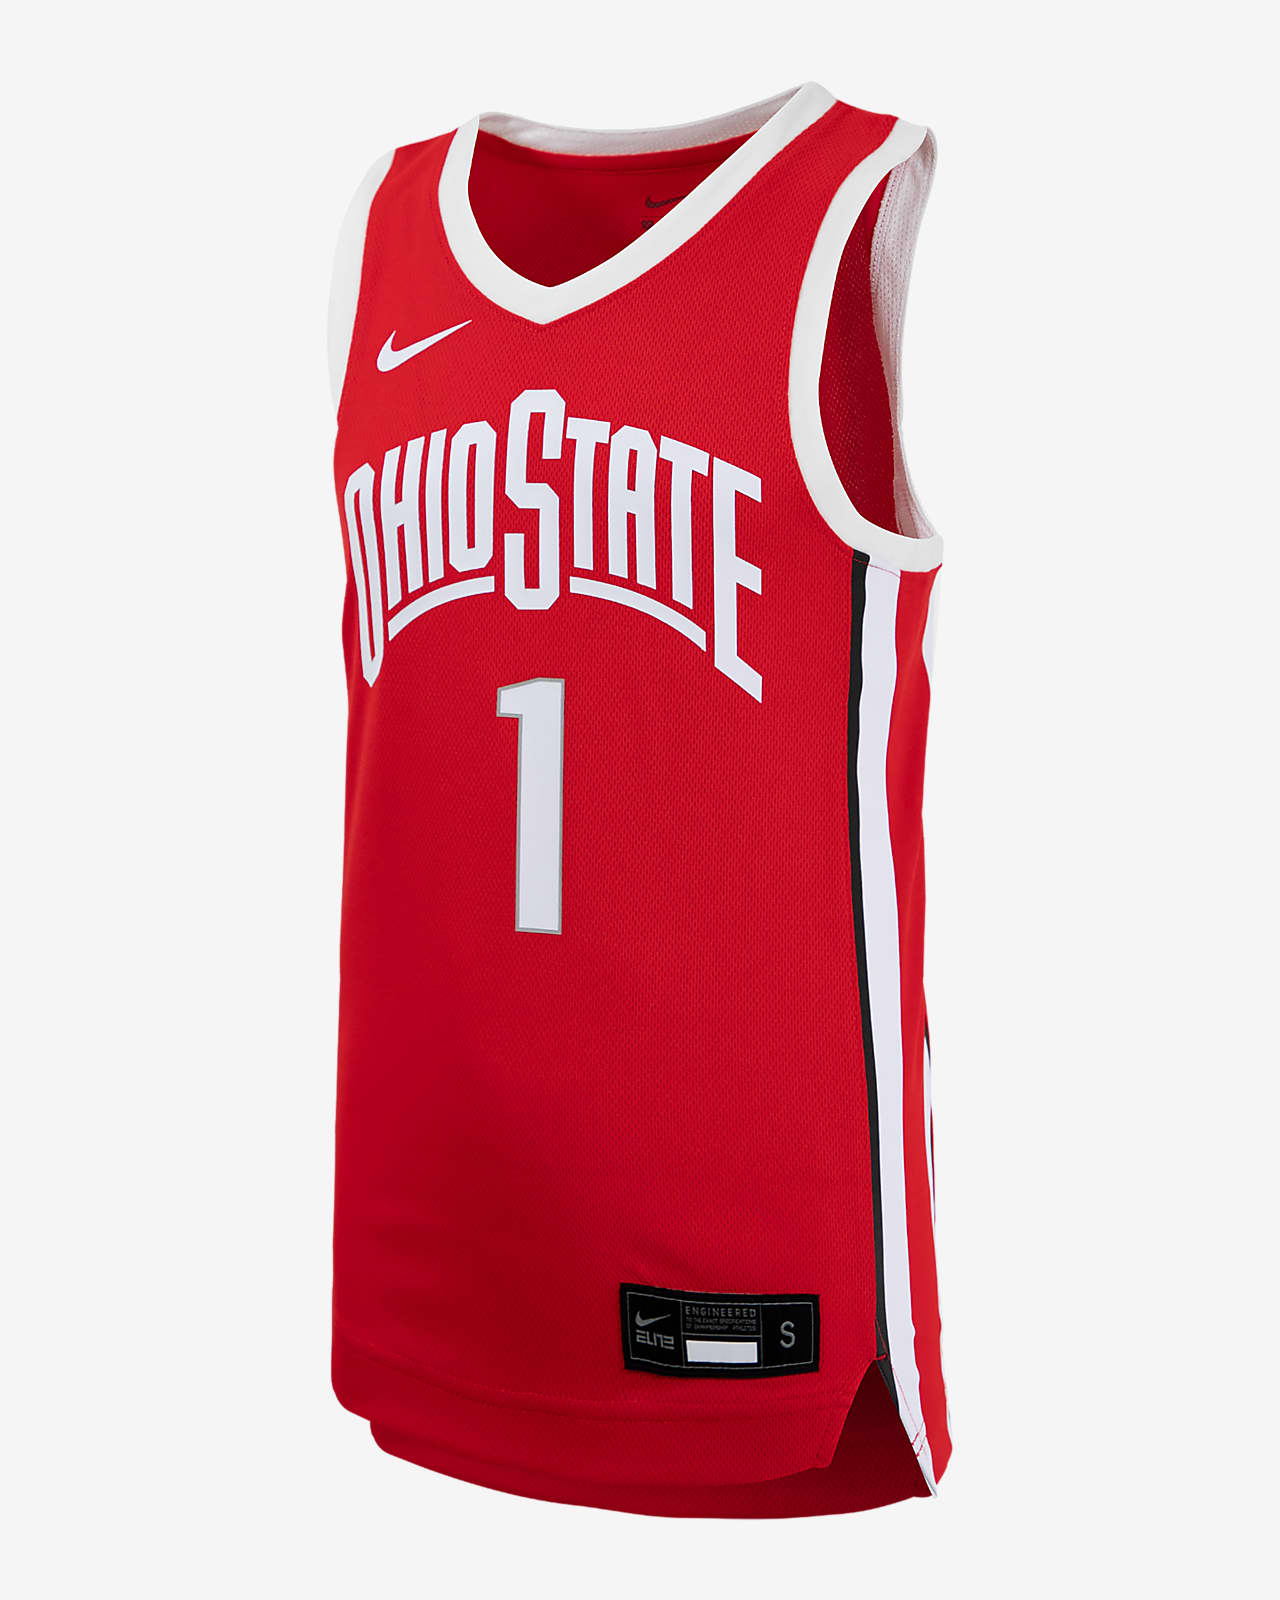 Nike College (Ohio State) Big Kids' Basketball Jersey